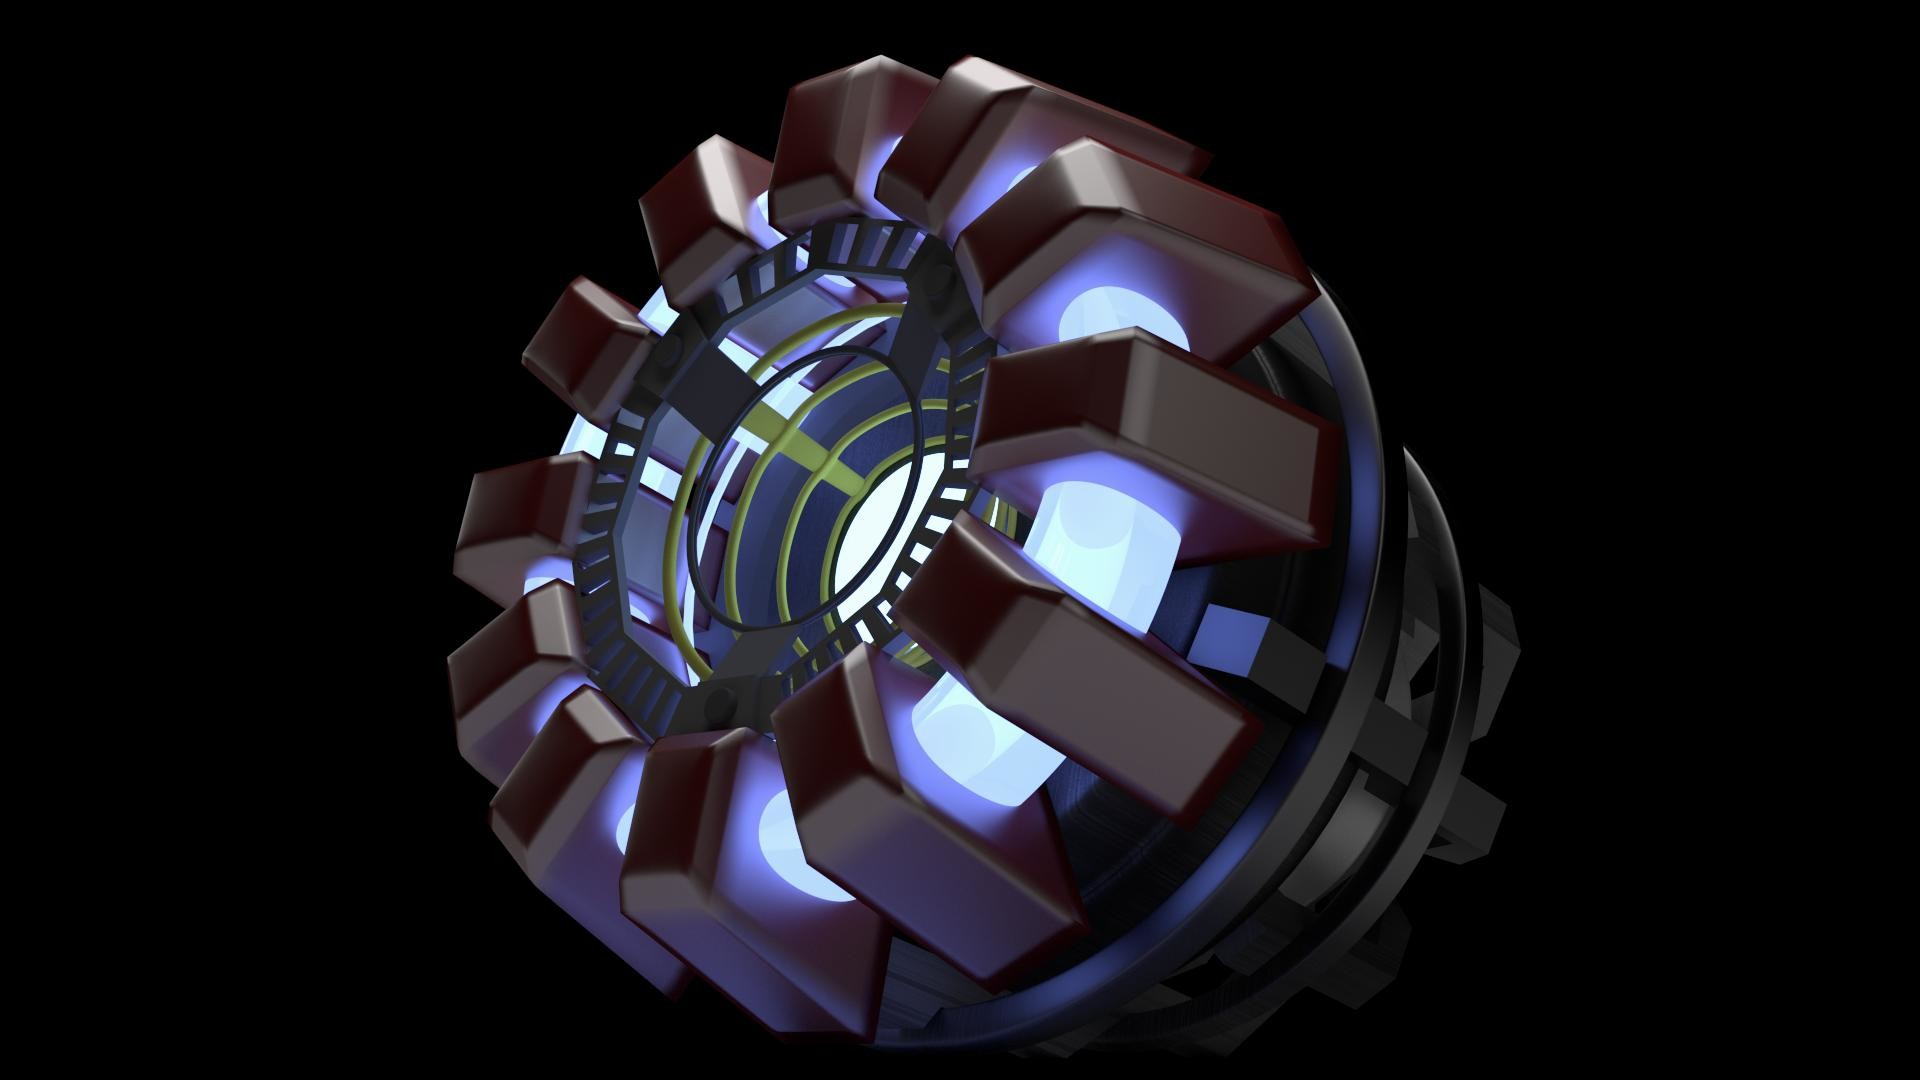 wallpaper.wiki-Full-HD-Arc-Reactor-Iron-Man-